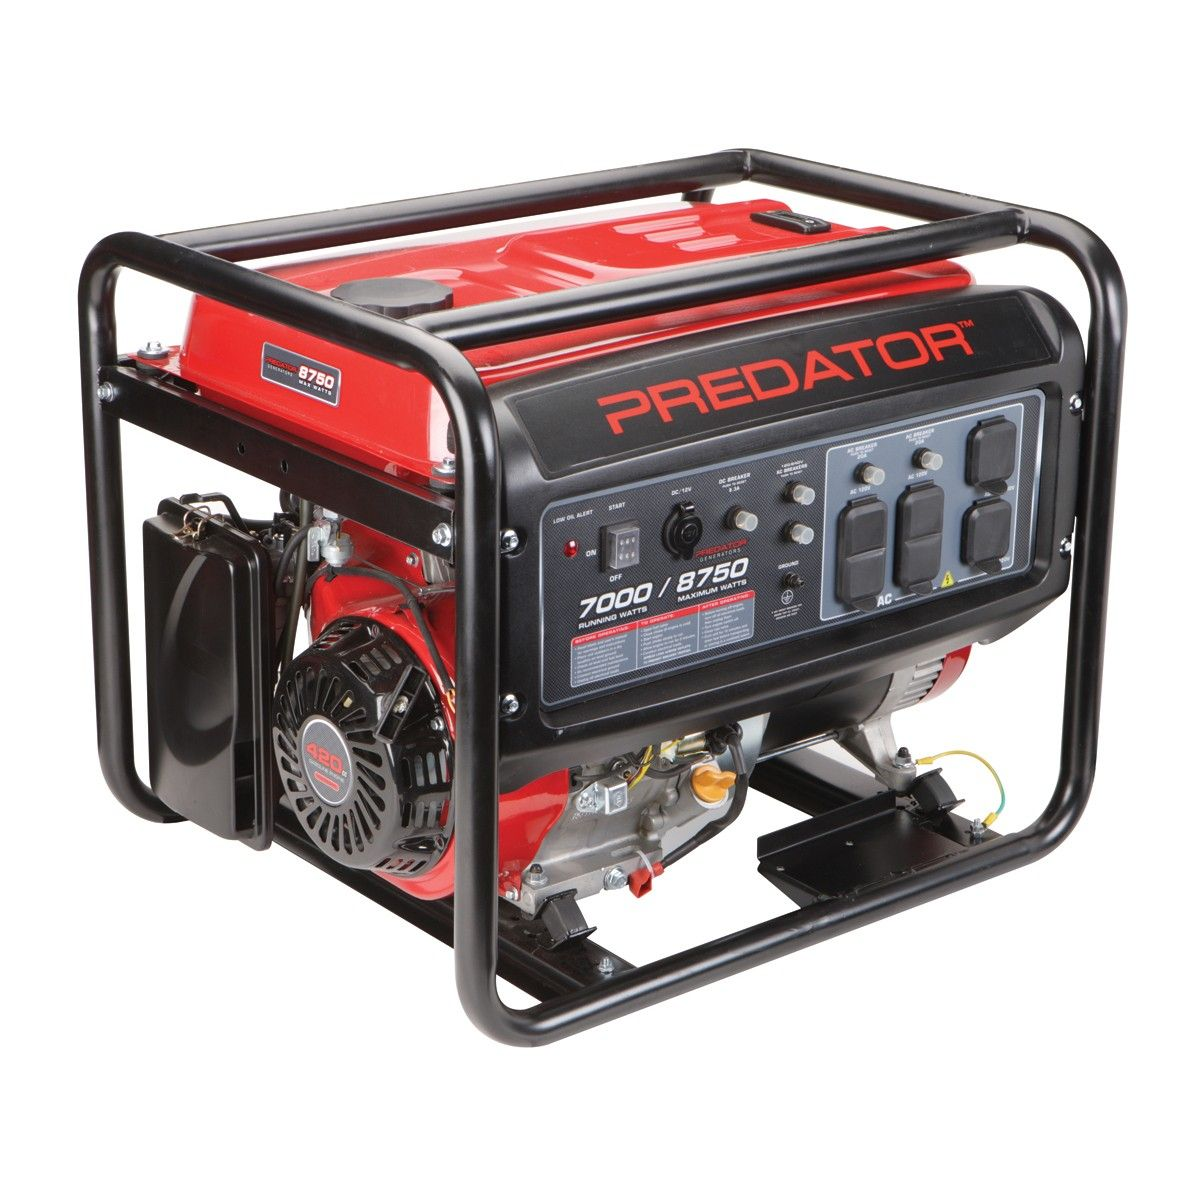 medium resolution of 420cc 8750 watts max 7000 watts rated portable generator